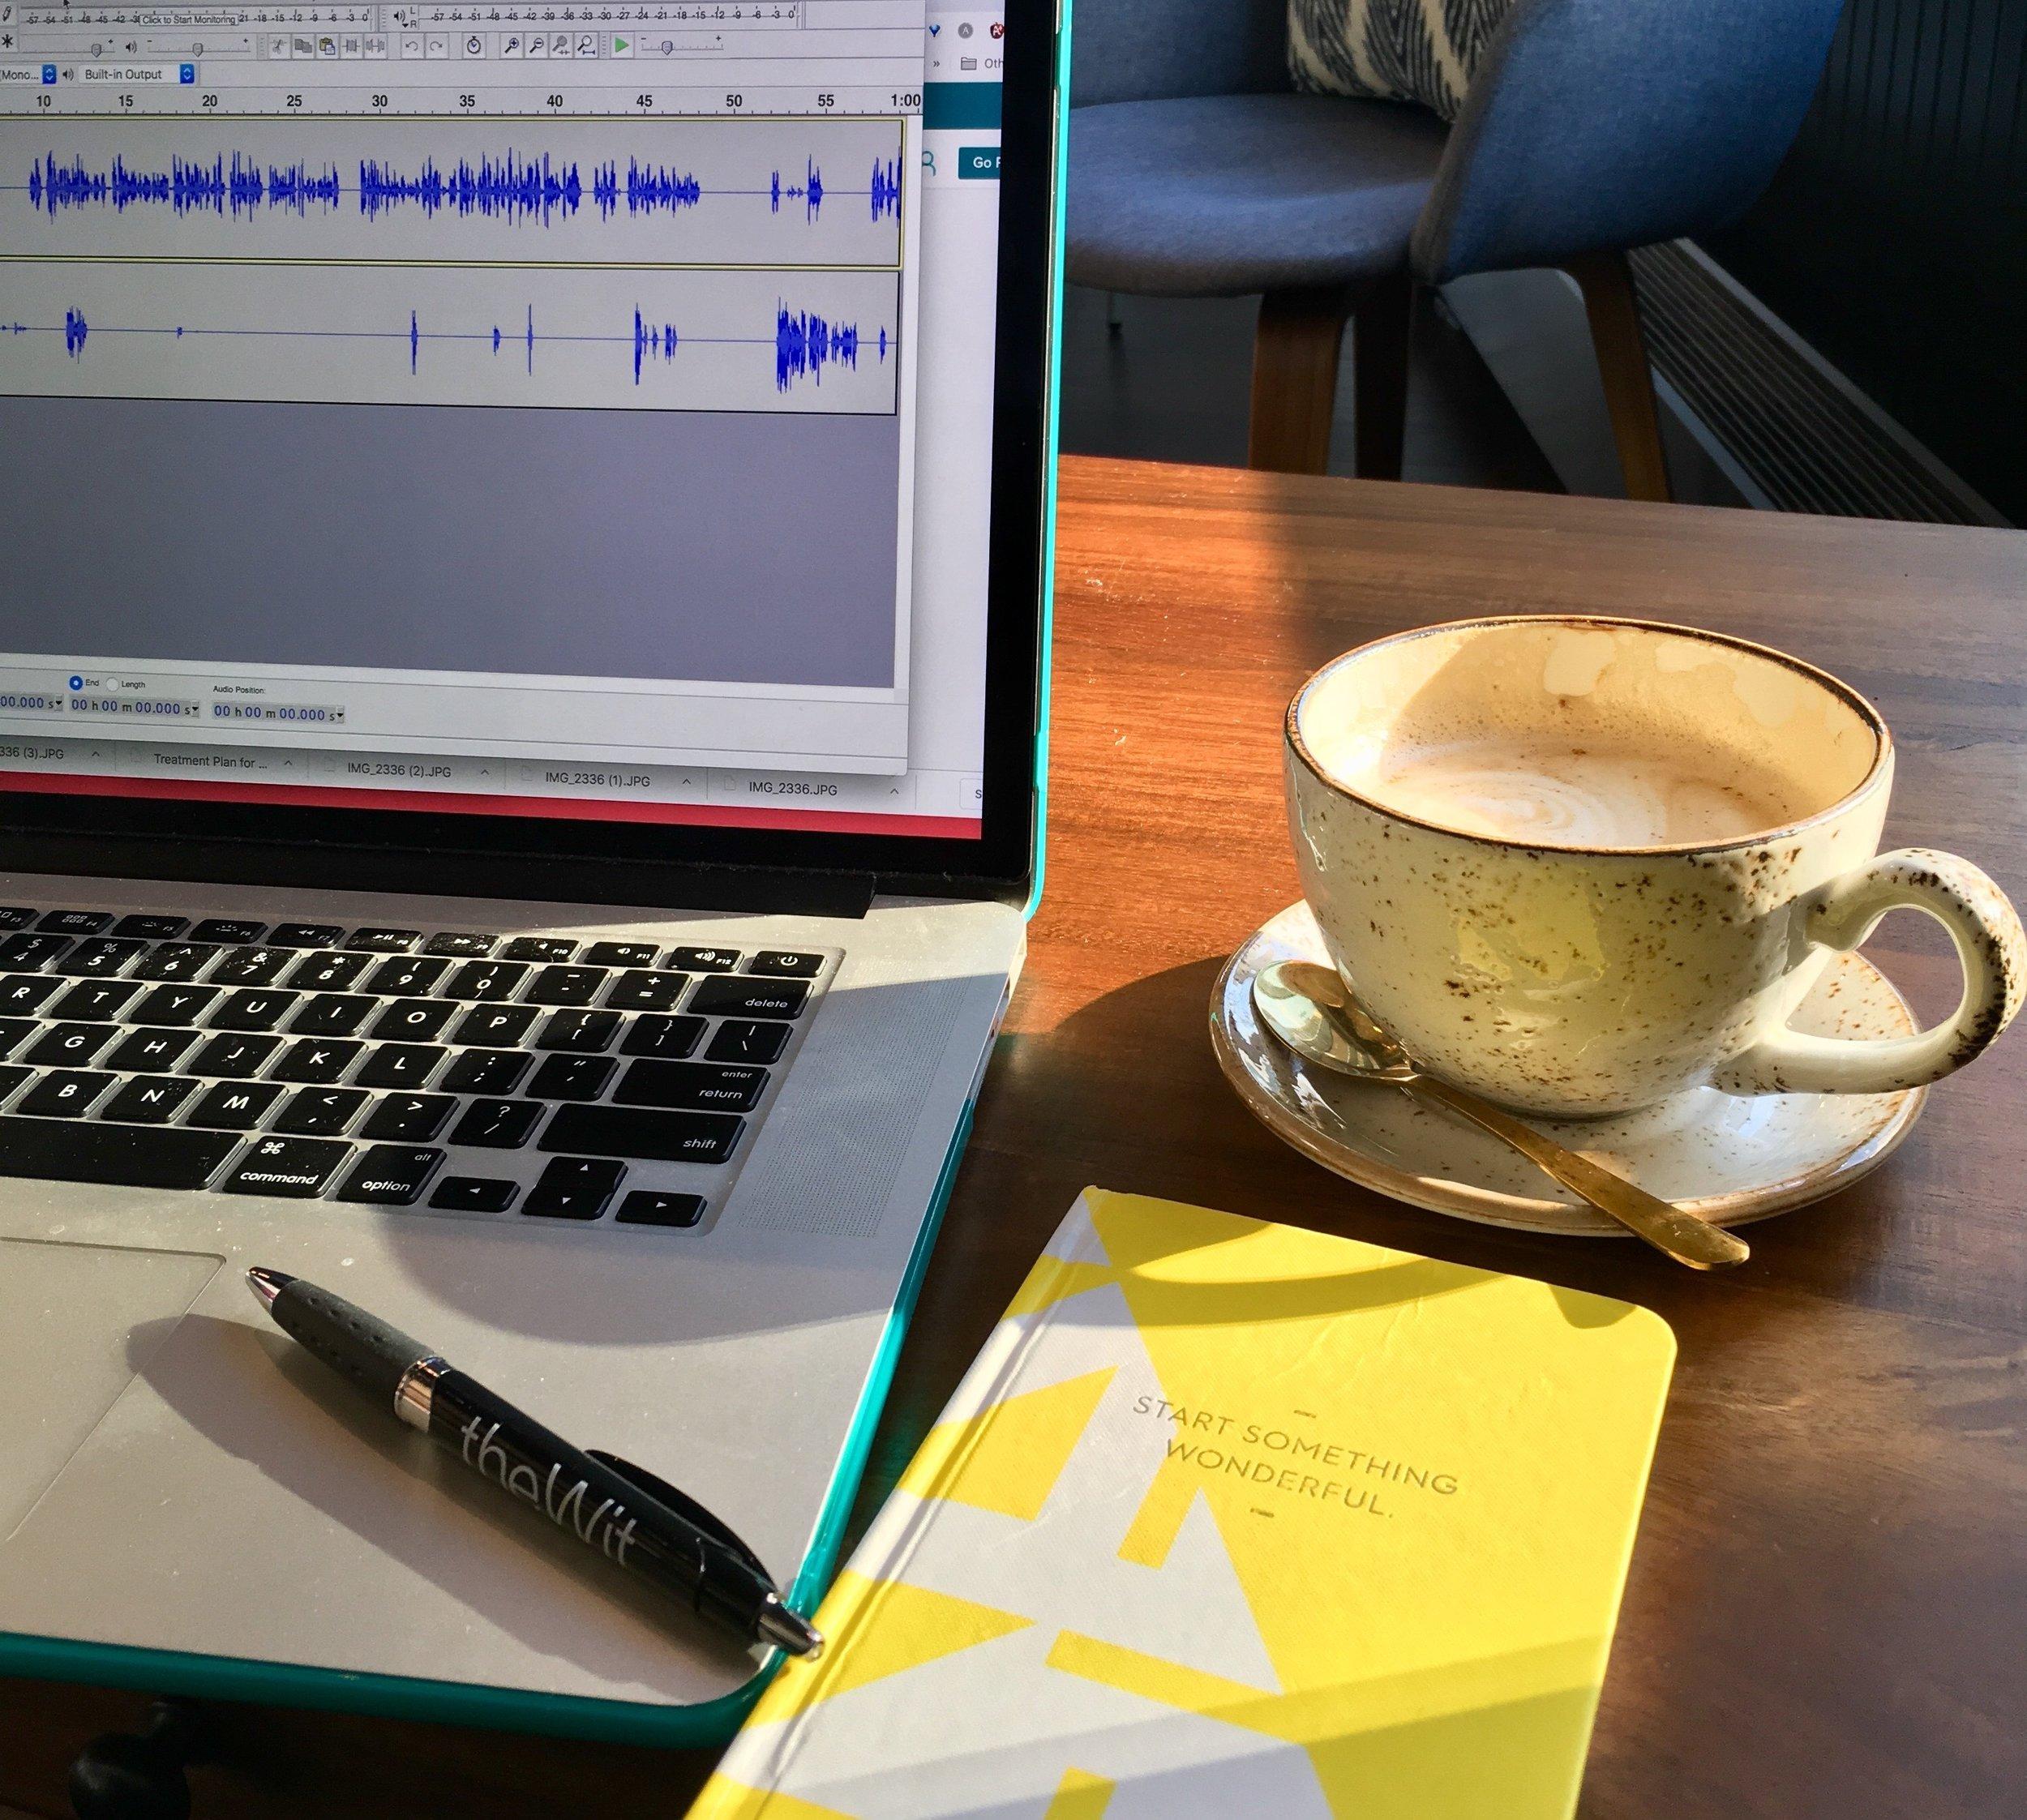 podcastediting.jpg